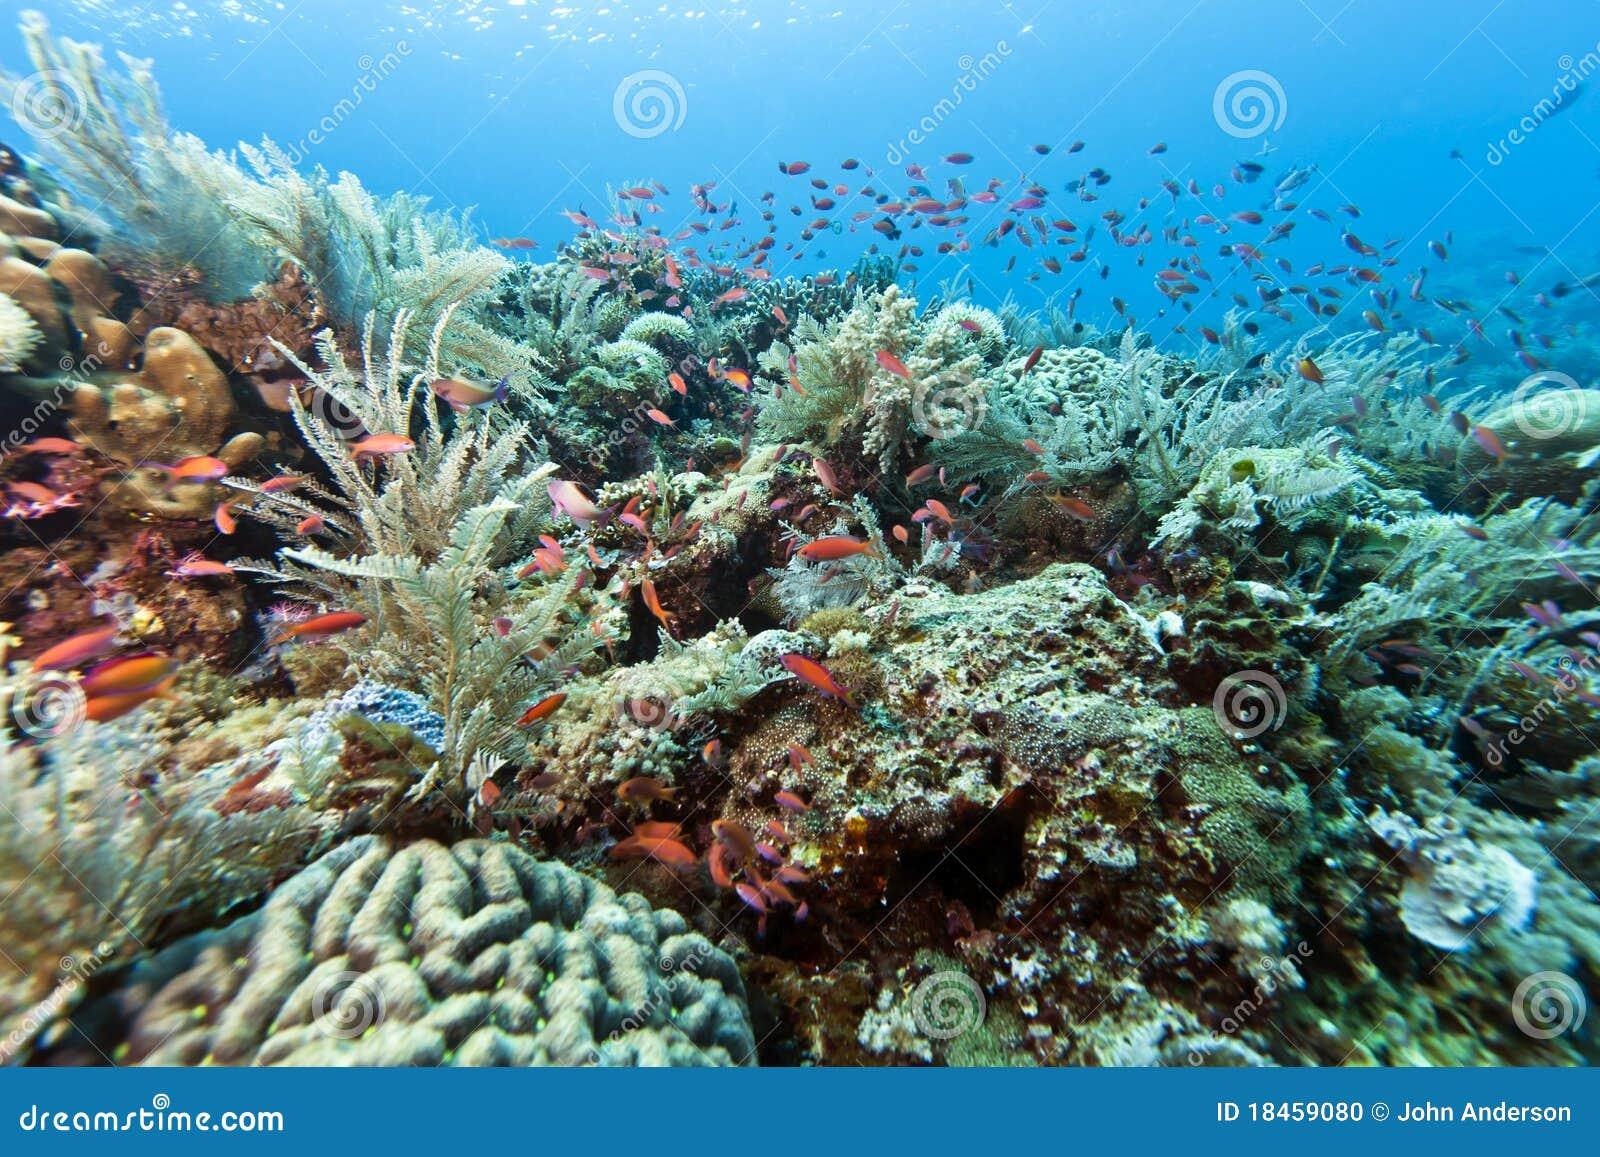 Coral Garden Indonesia Stock Photo Image 18459080